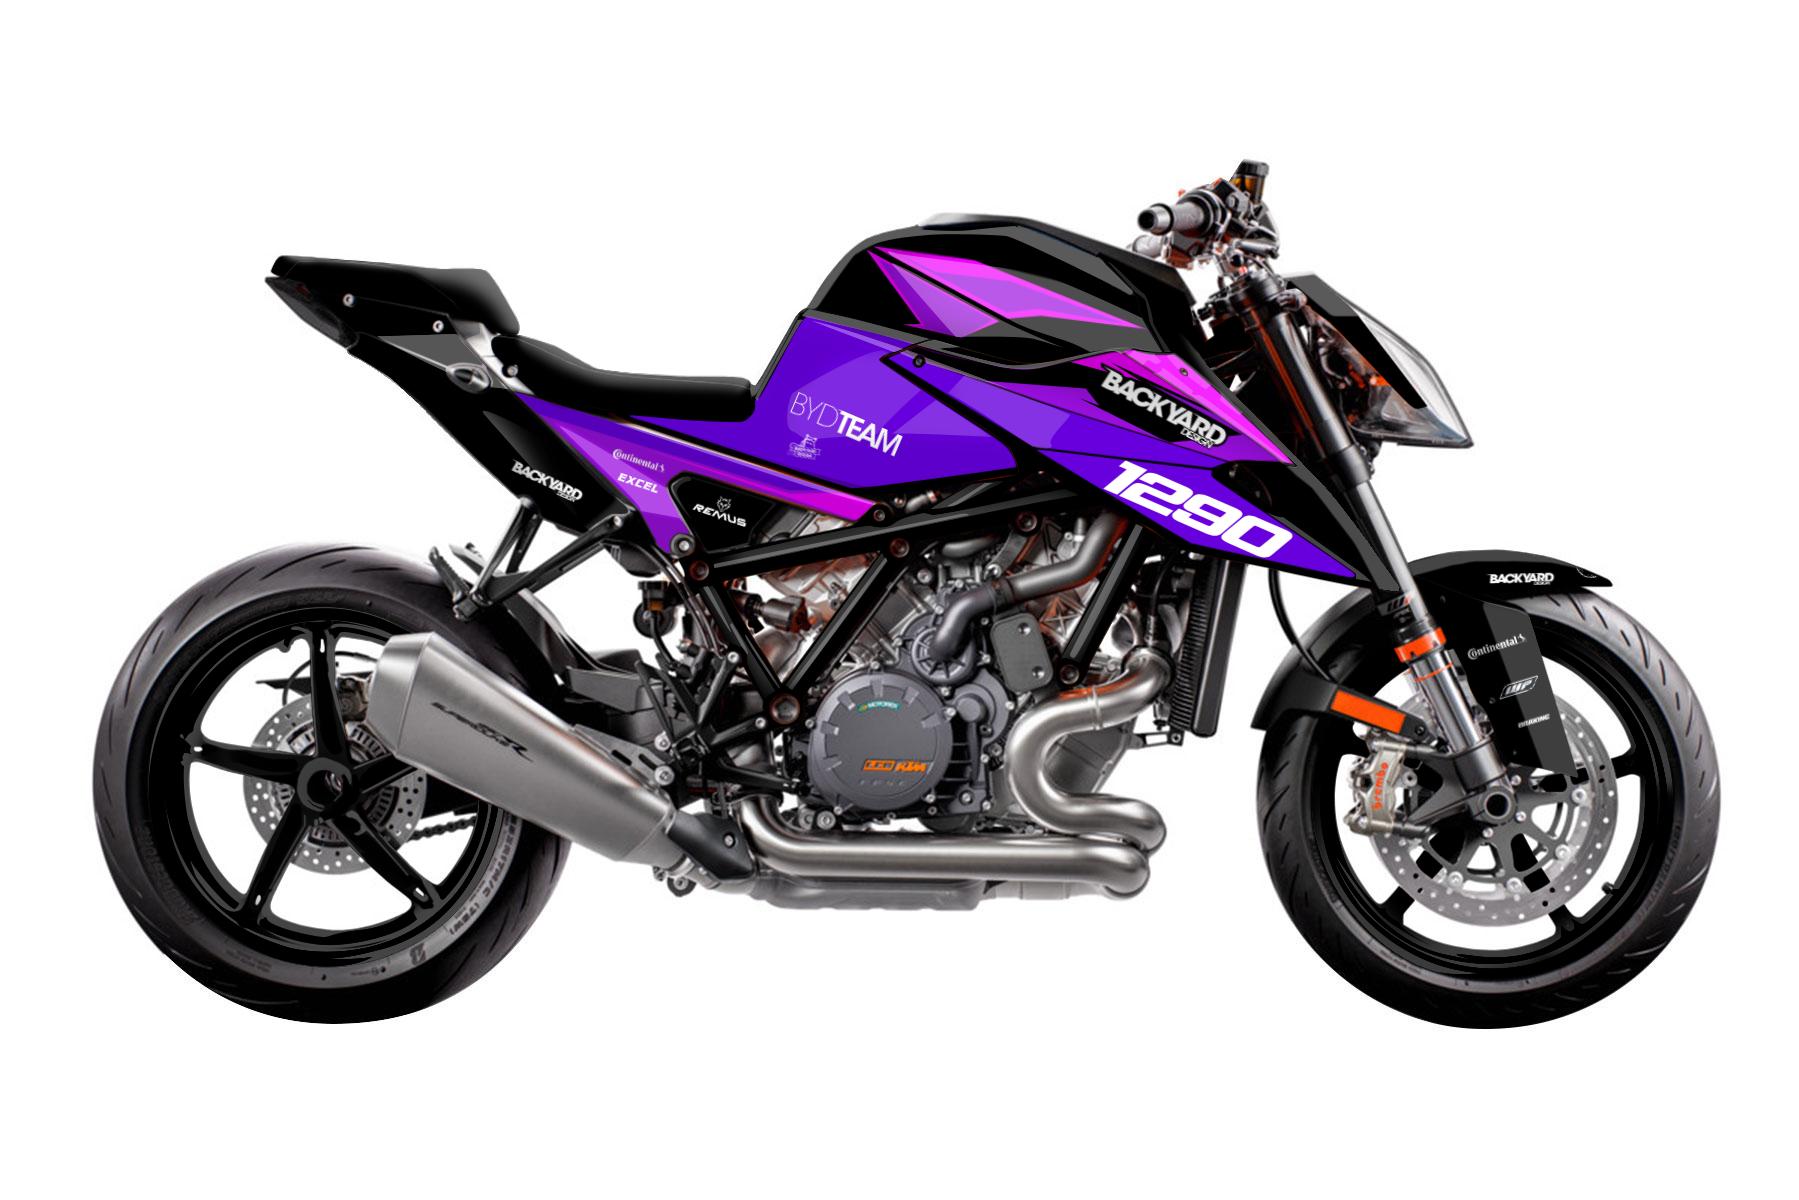 KTM Duke 1290 - 2020-2022 - Backyard Design Supermoto Dekor Kit - General Pro